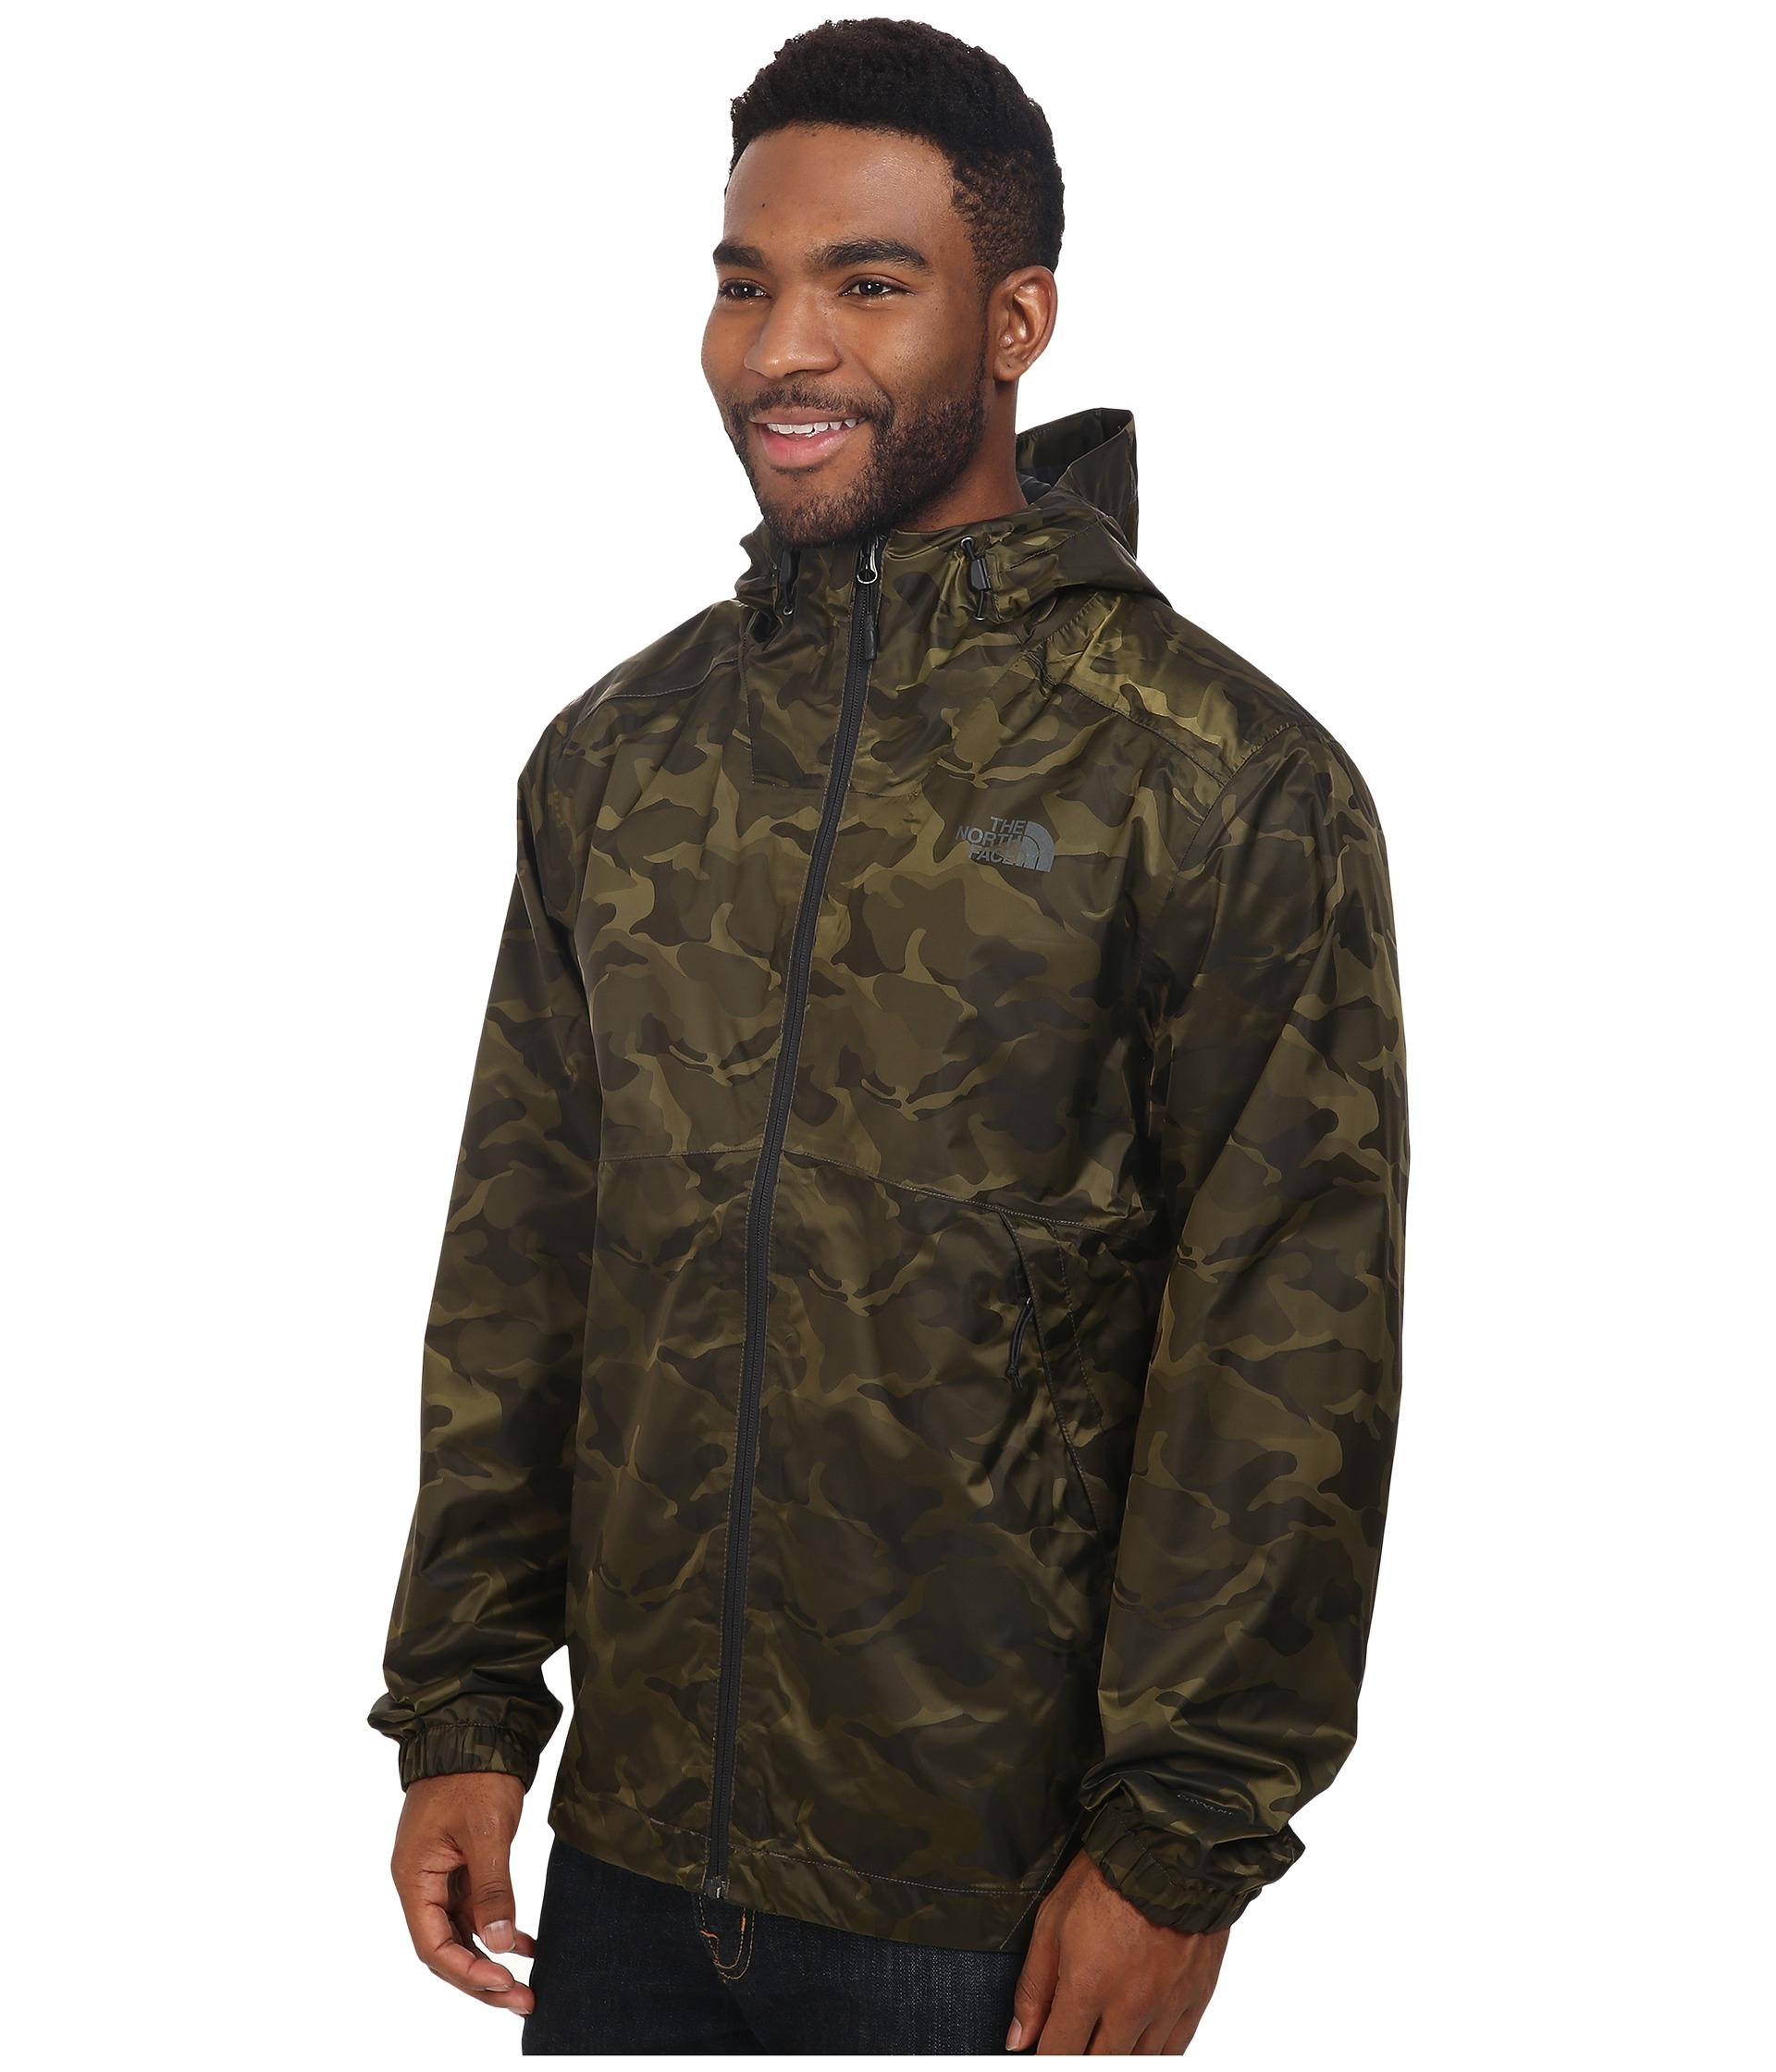 Lyst - The North Face Millerton Jacket for Men 9c8b1e2c44b3